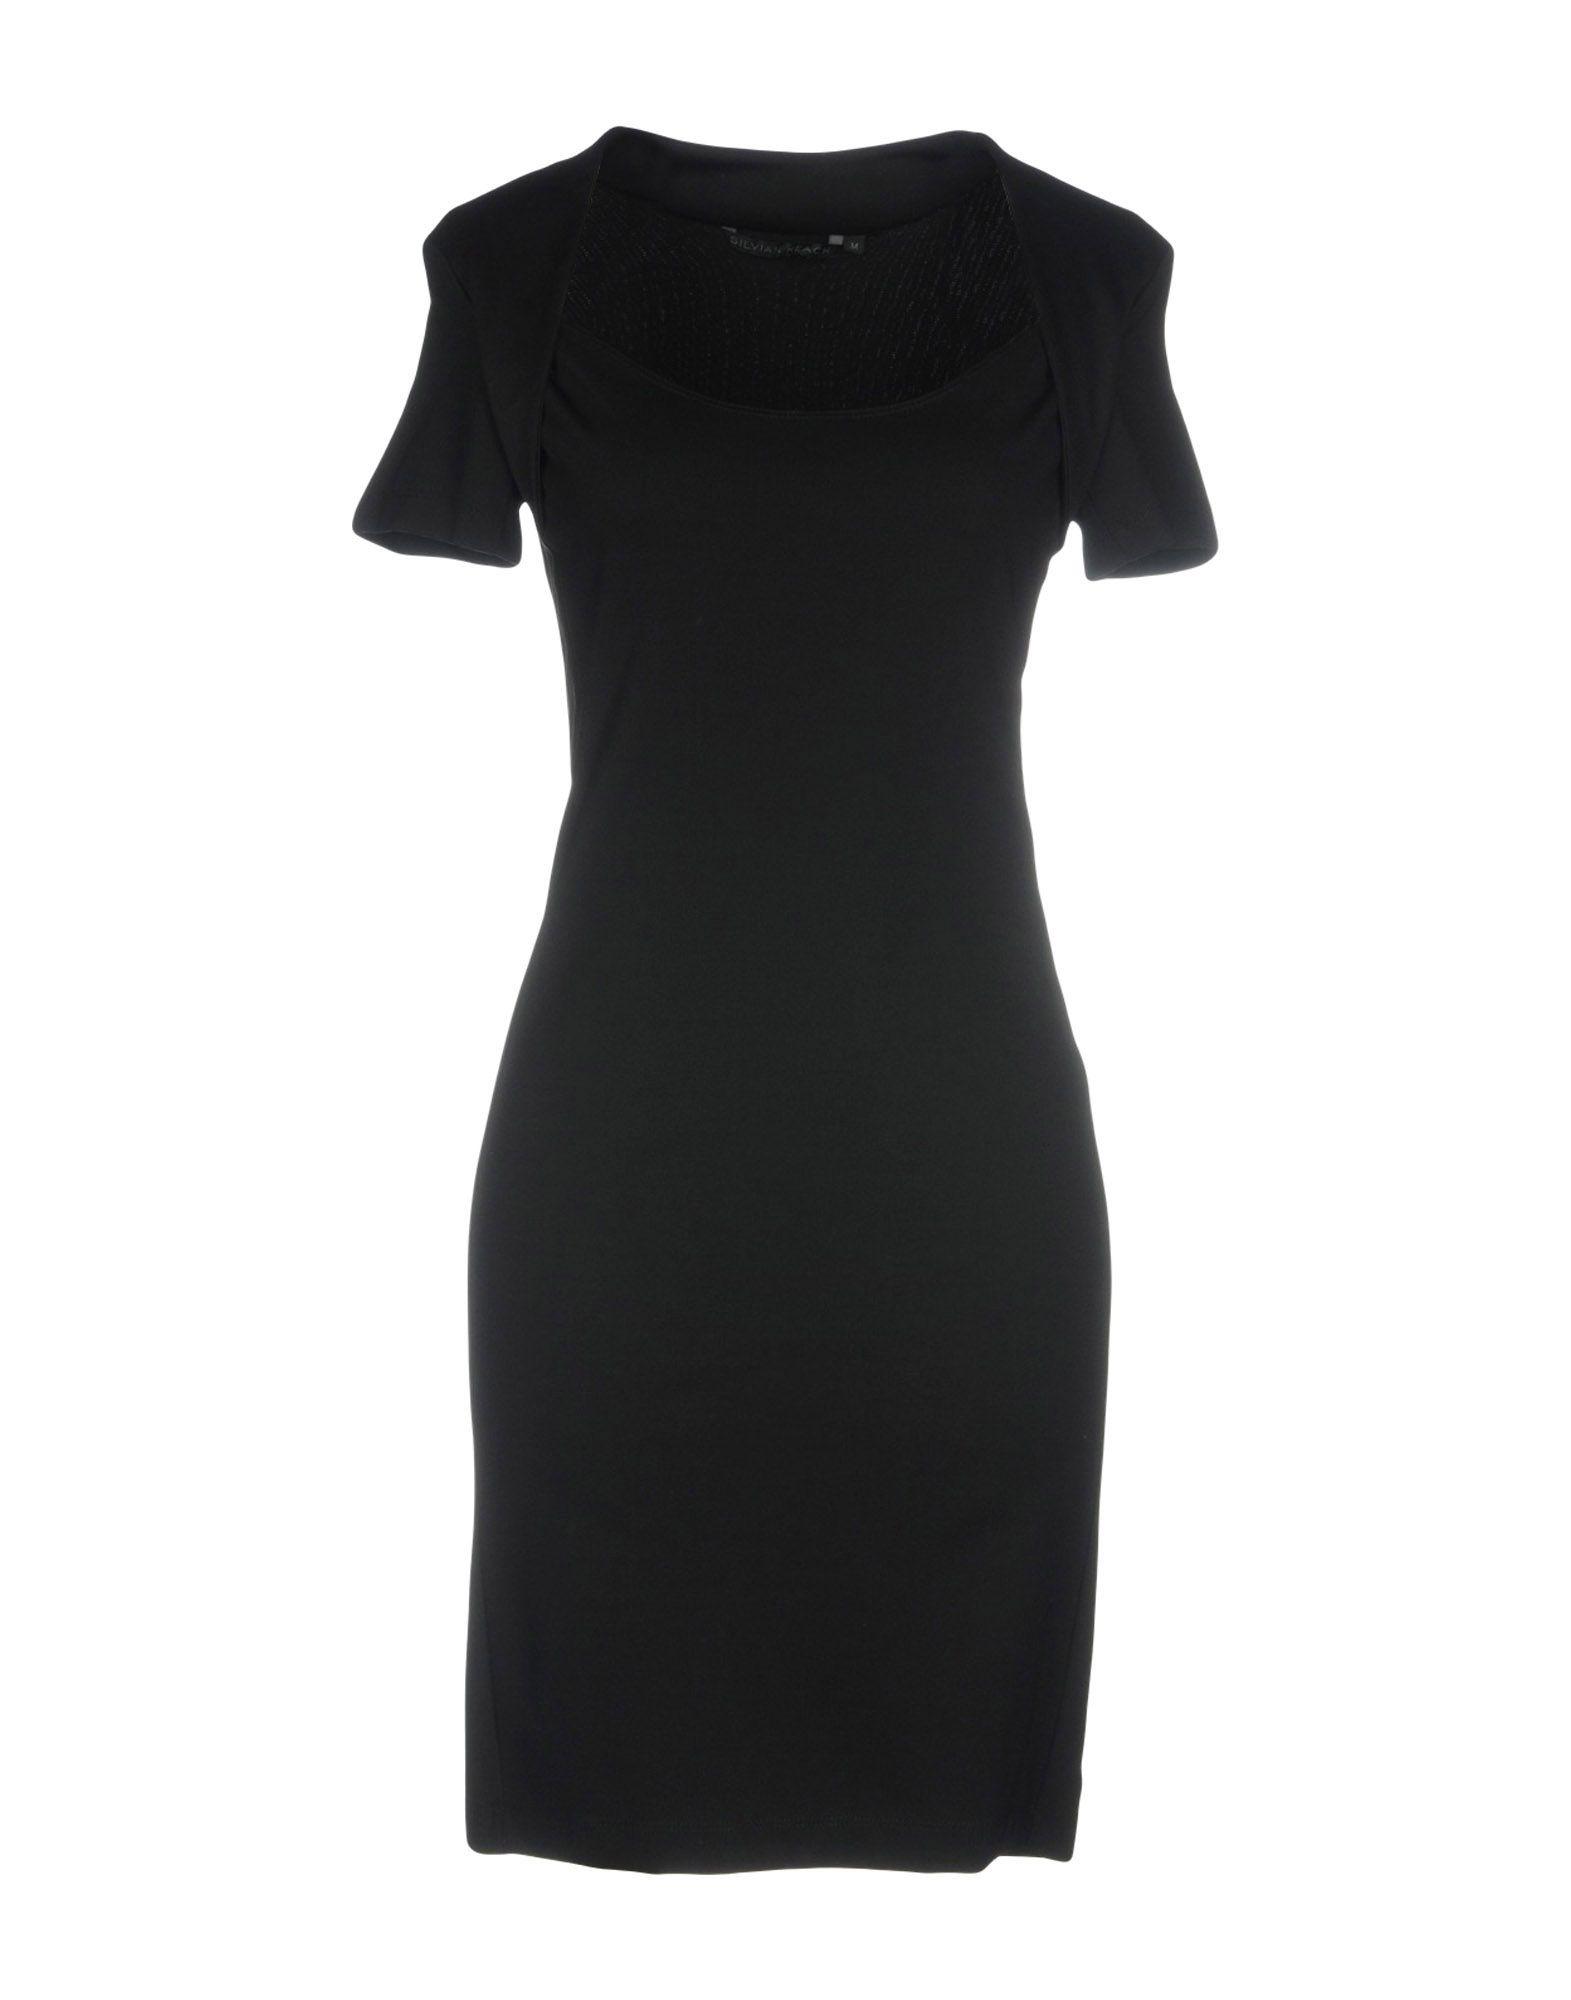 SILVIAN HEACH Короткое платье джинсы женские silvian heach moose veronica цвет черный pga18875je d black размер 26 42 44